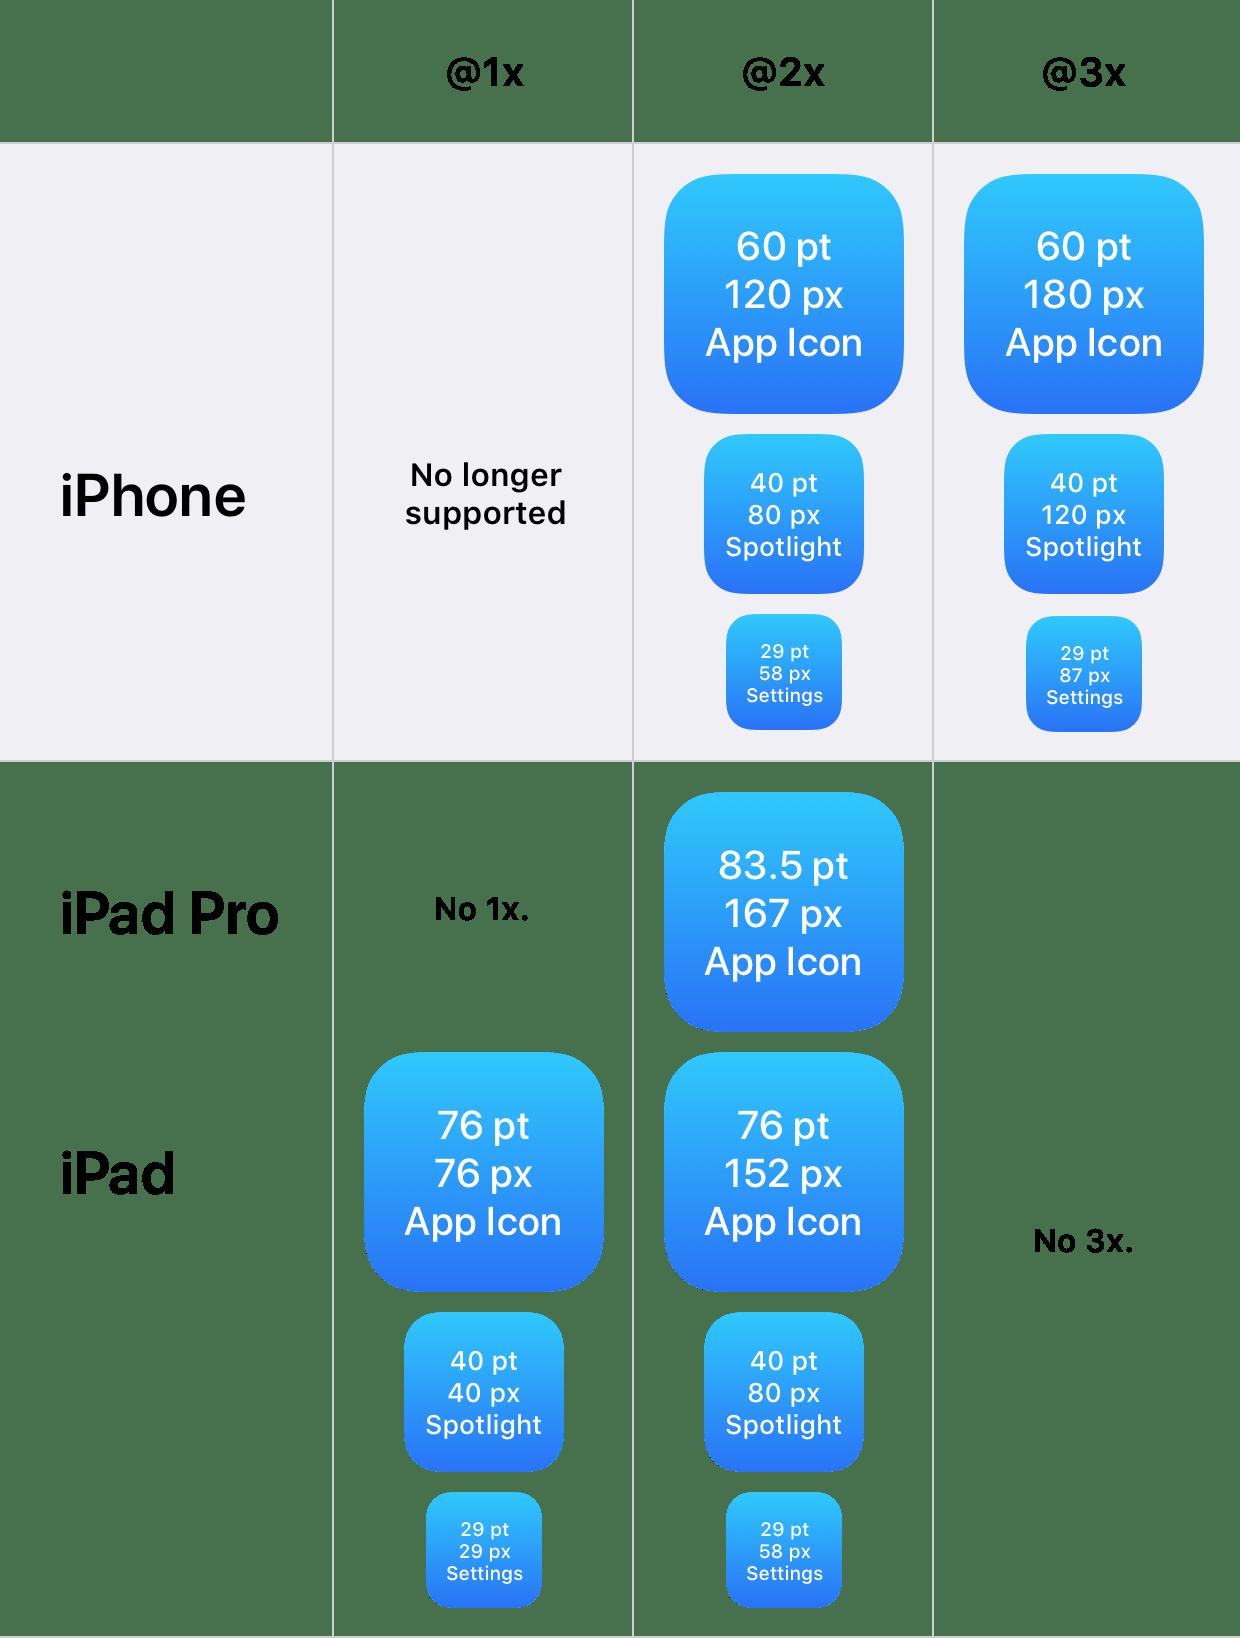 Дизайн под iPhone X. Гайдлайны для iOS 11 - 13